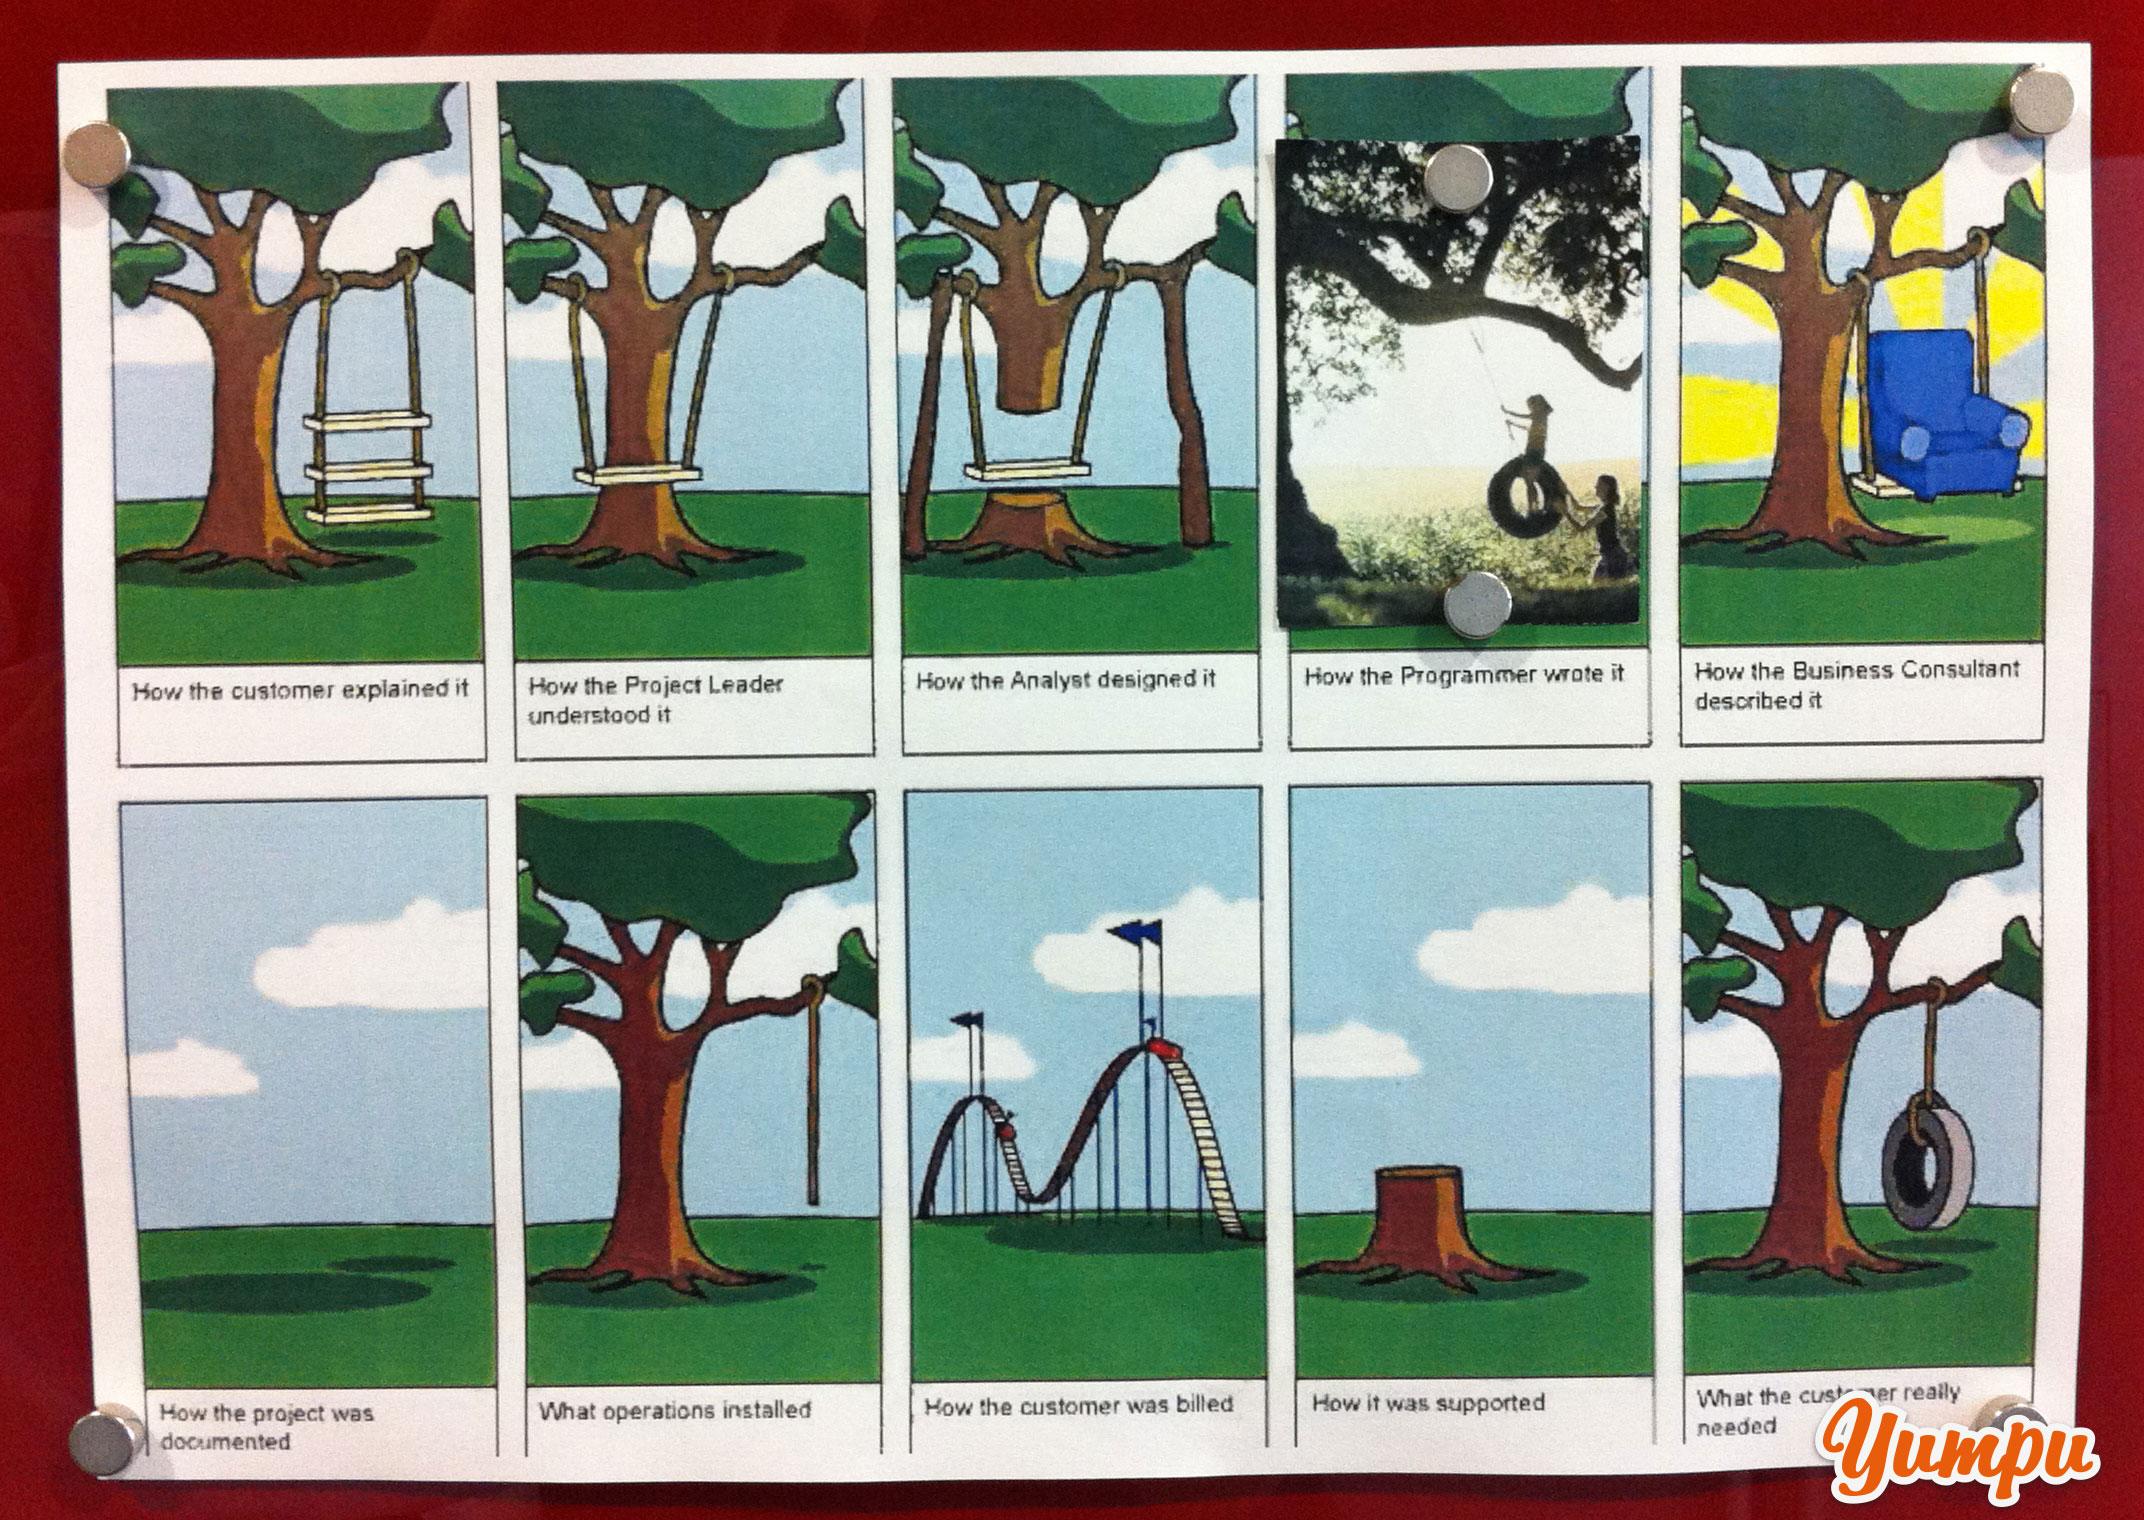 How-the-Projectmanager-understood-it-Cartoon